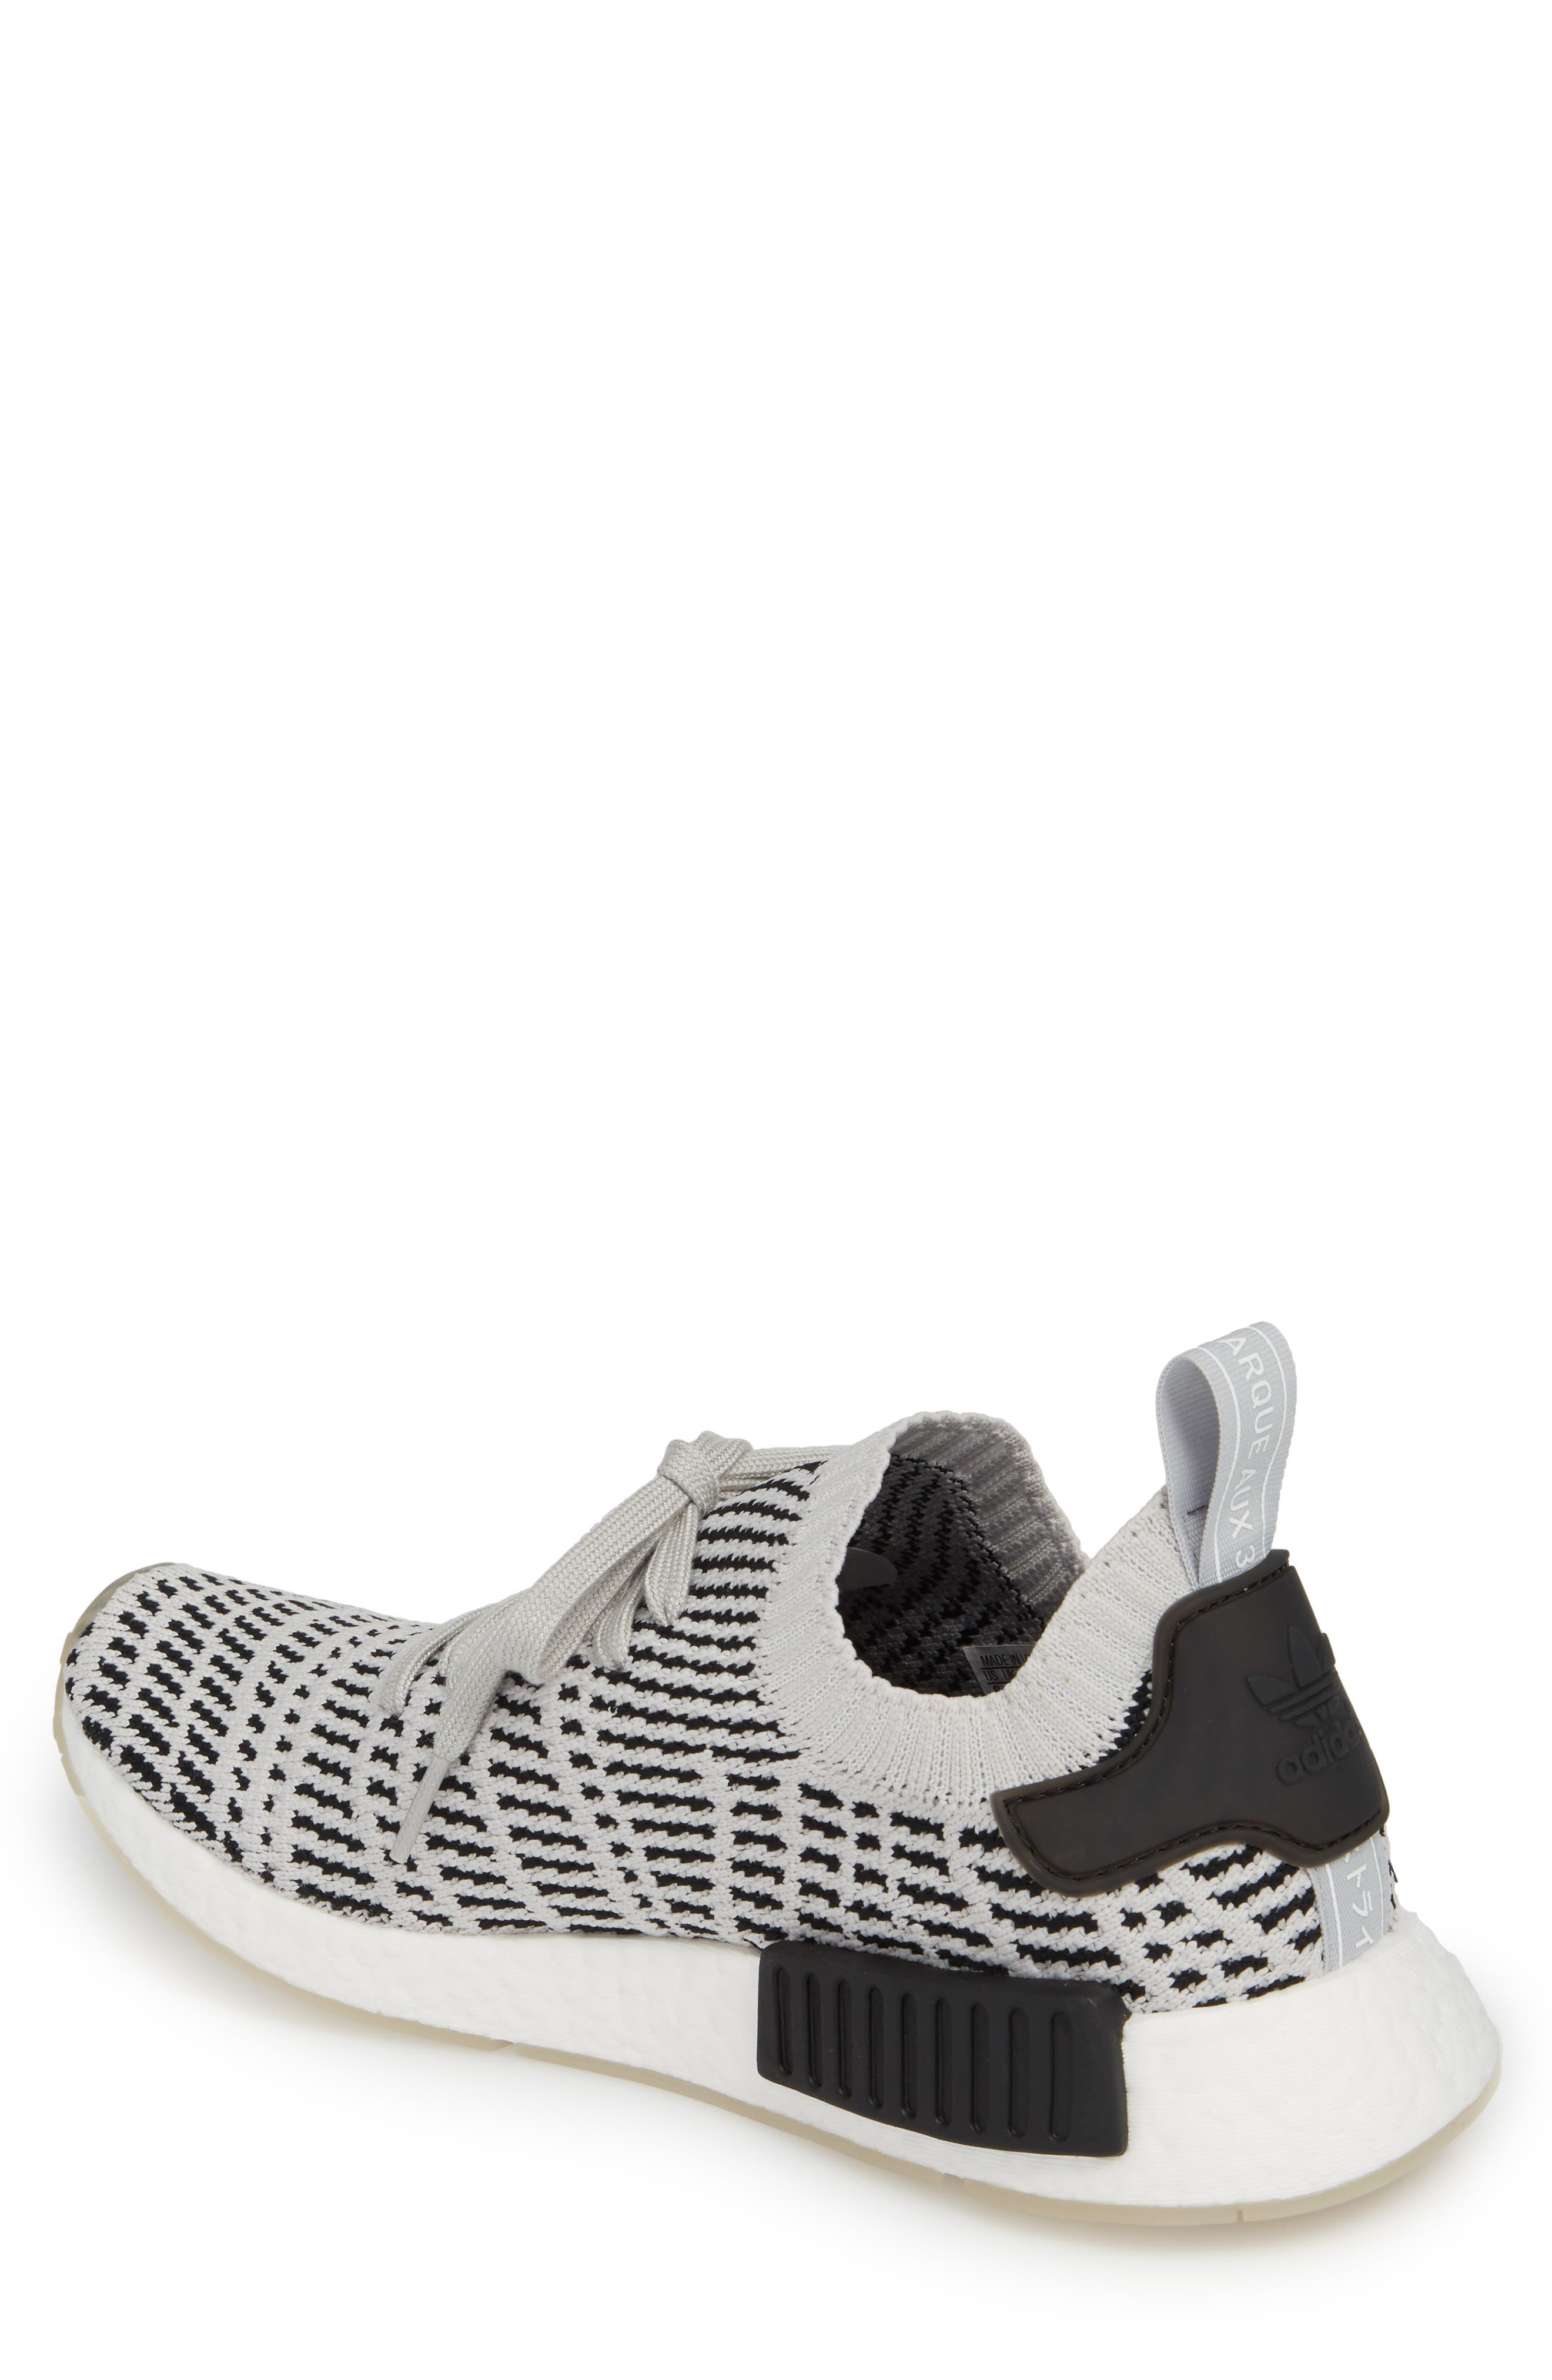 NMD R1 STLT Primeknit Sneaker,                             Alternate thumbnail 2, color,                             Grey/ Core Black